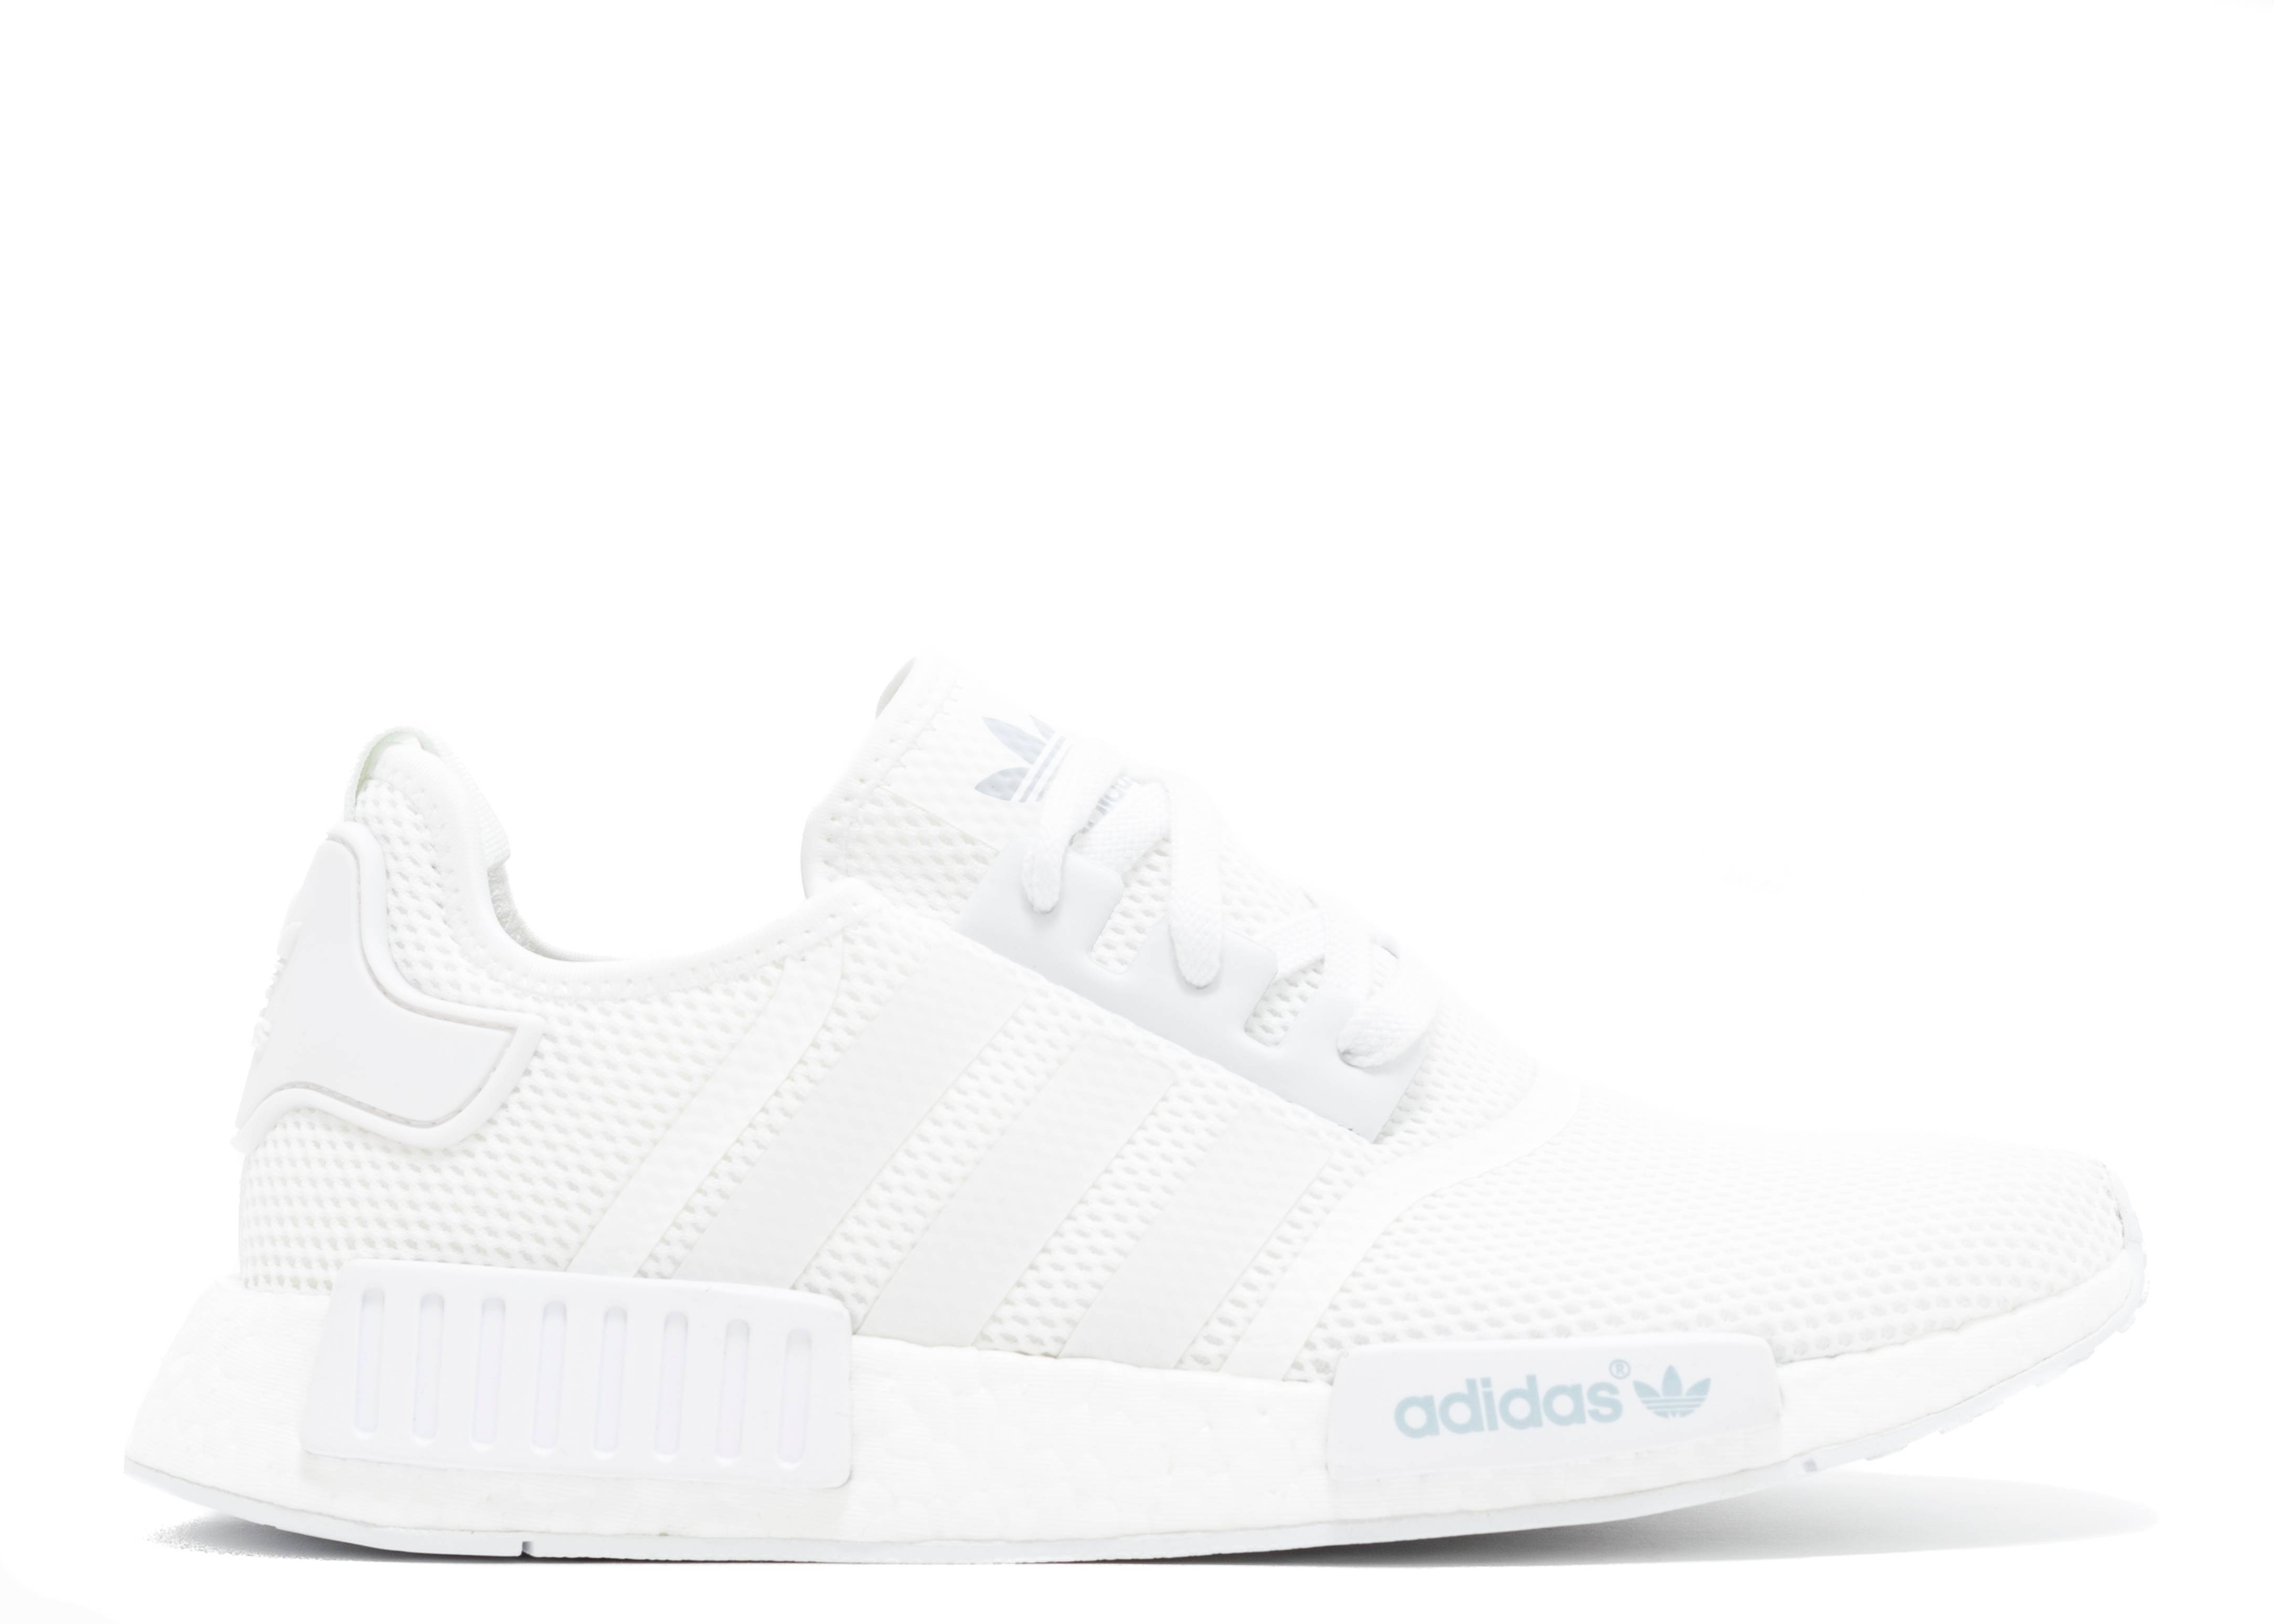 nmd r1 white